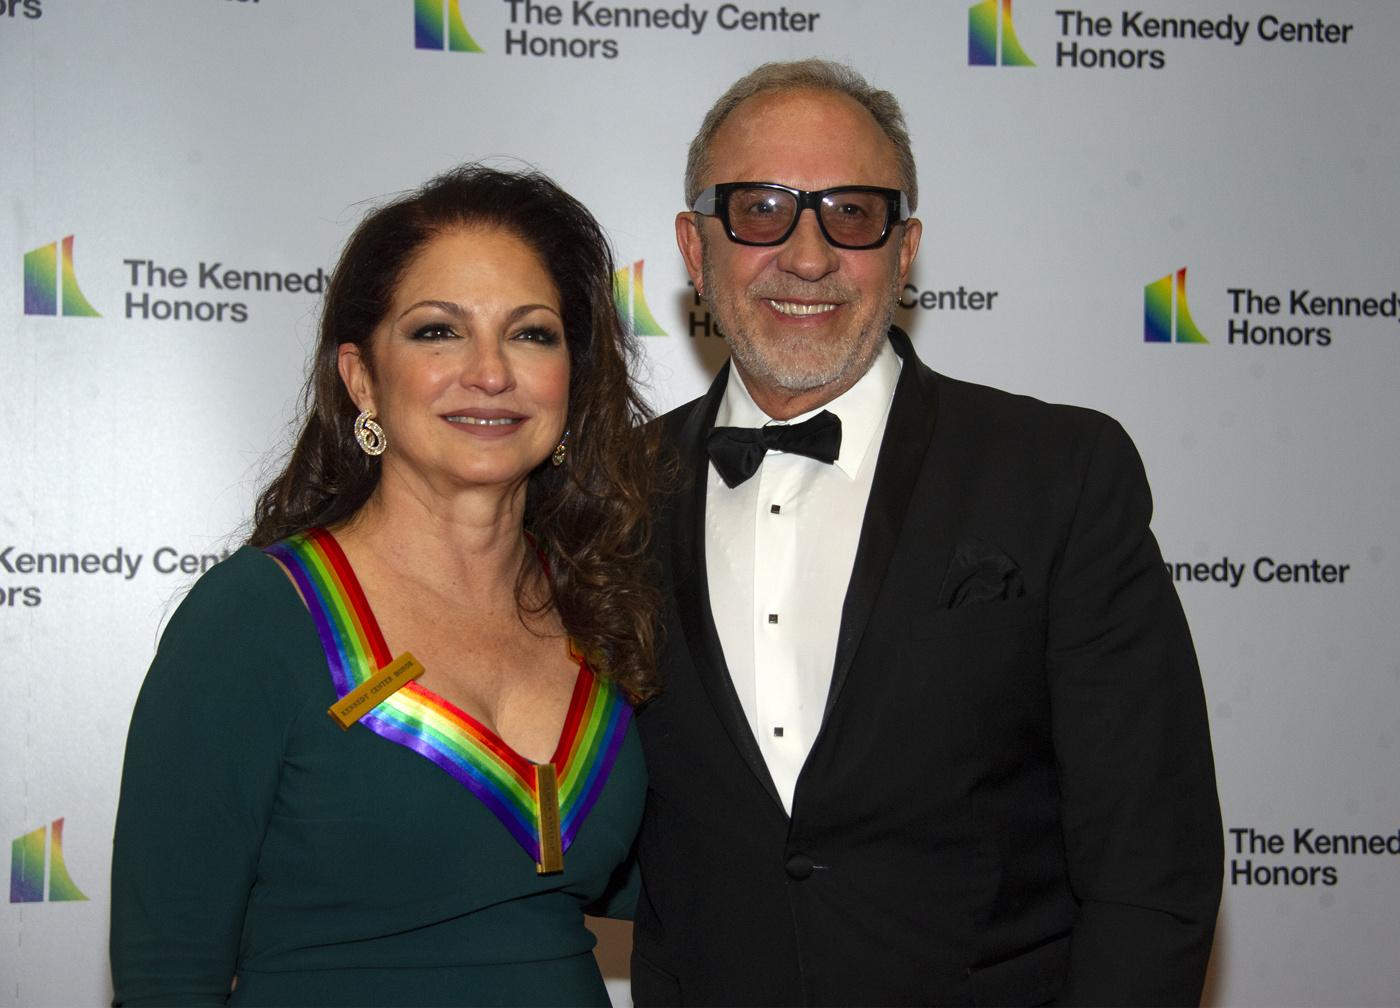 Hamilton's Creative Team, Cher & More Receive Kennedy Center Honors